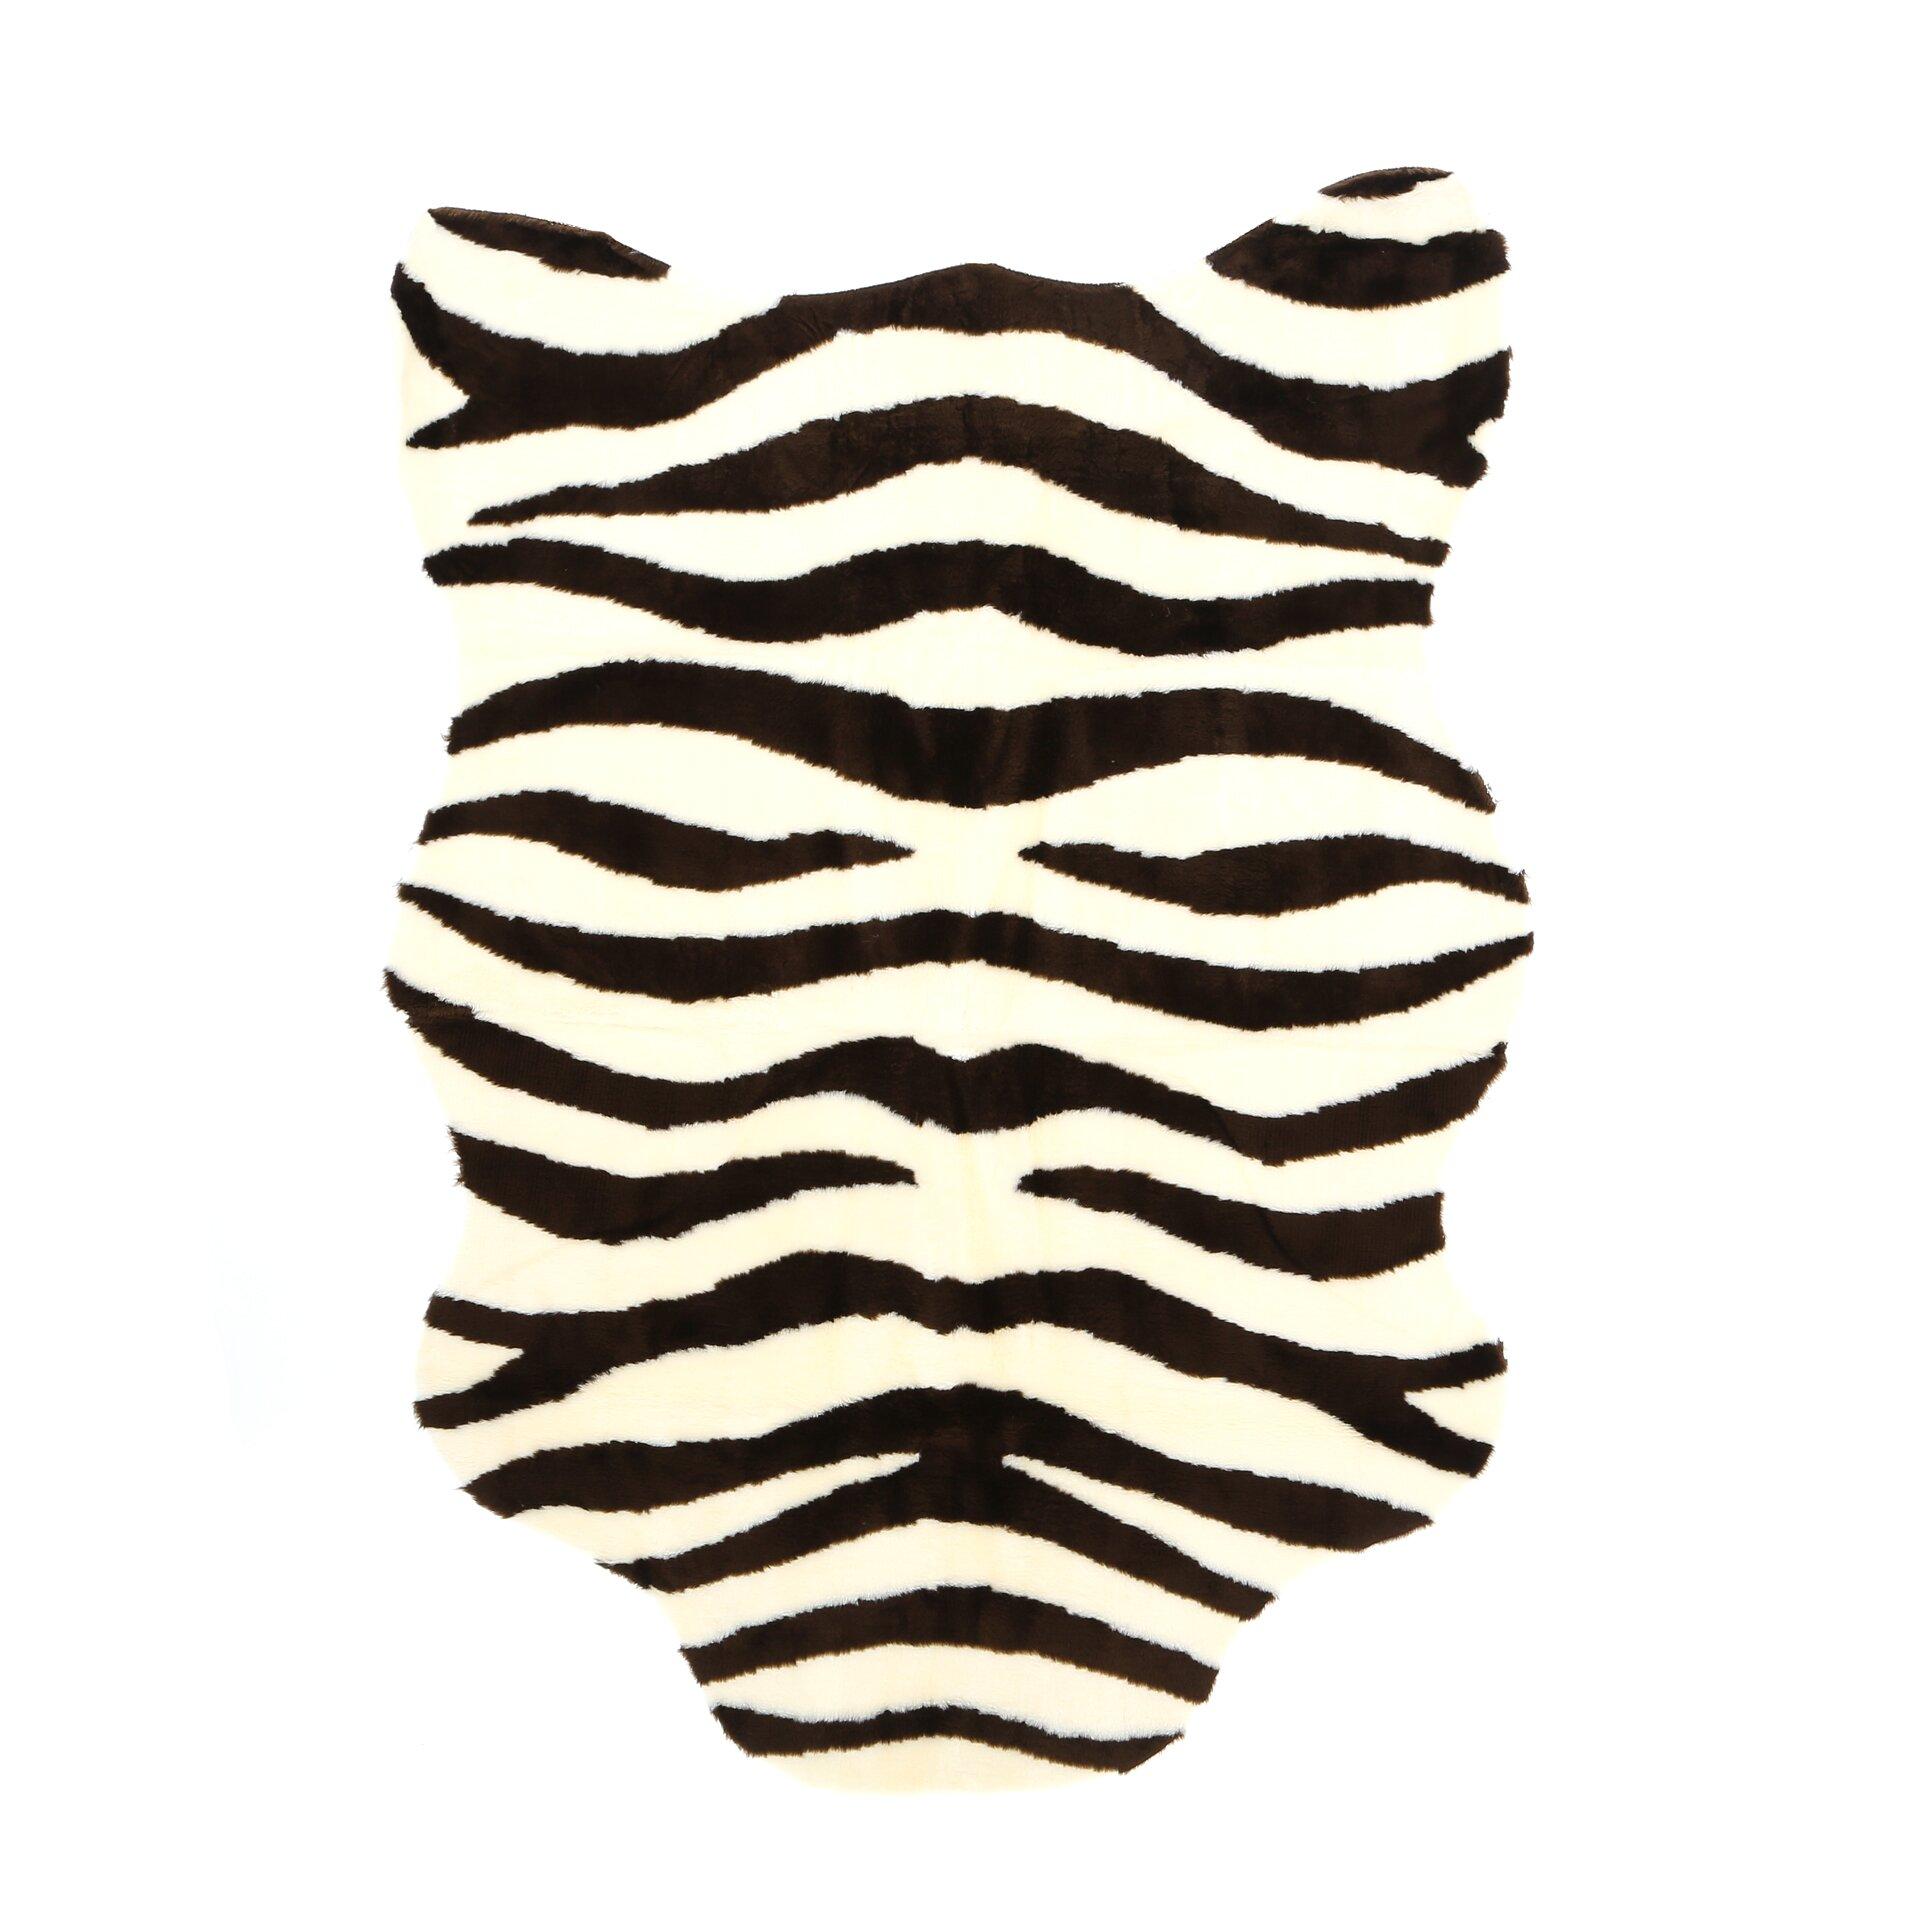 Zebra Rug Wayfair: Walk On Me Animal Ivory/Brown Zebra Area Rug & Reviews